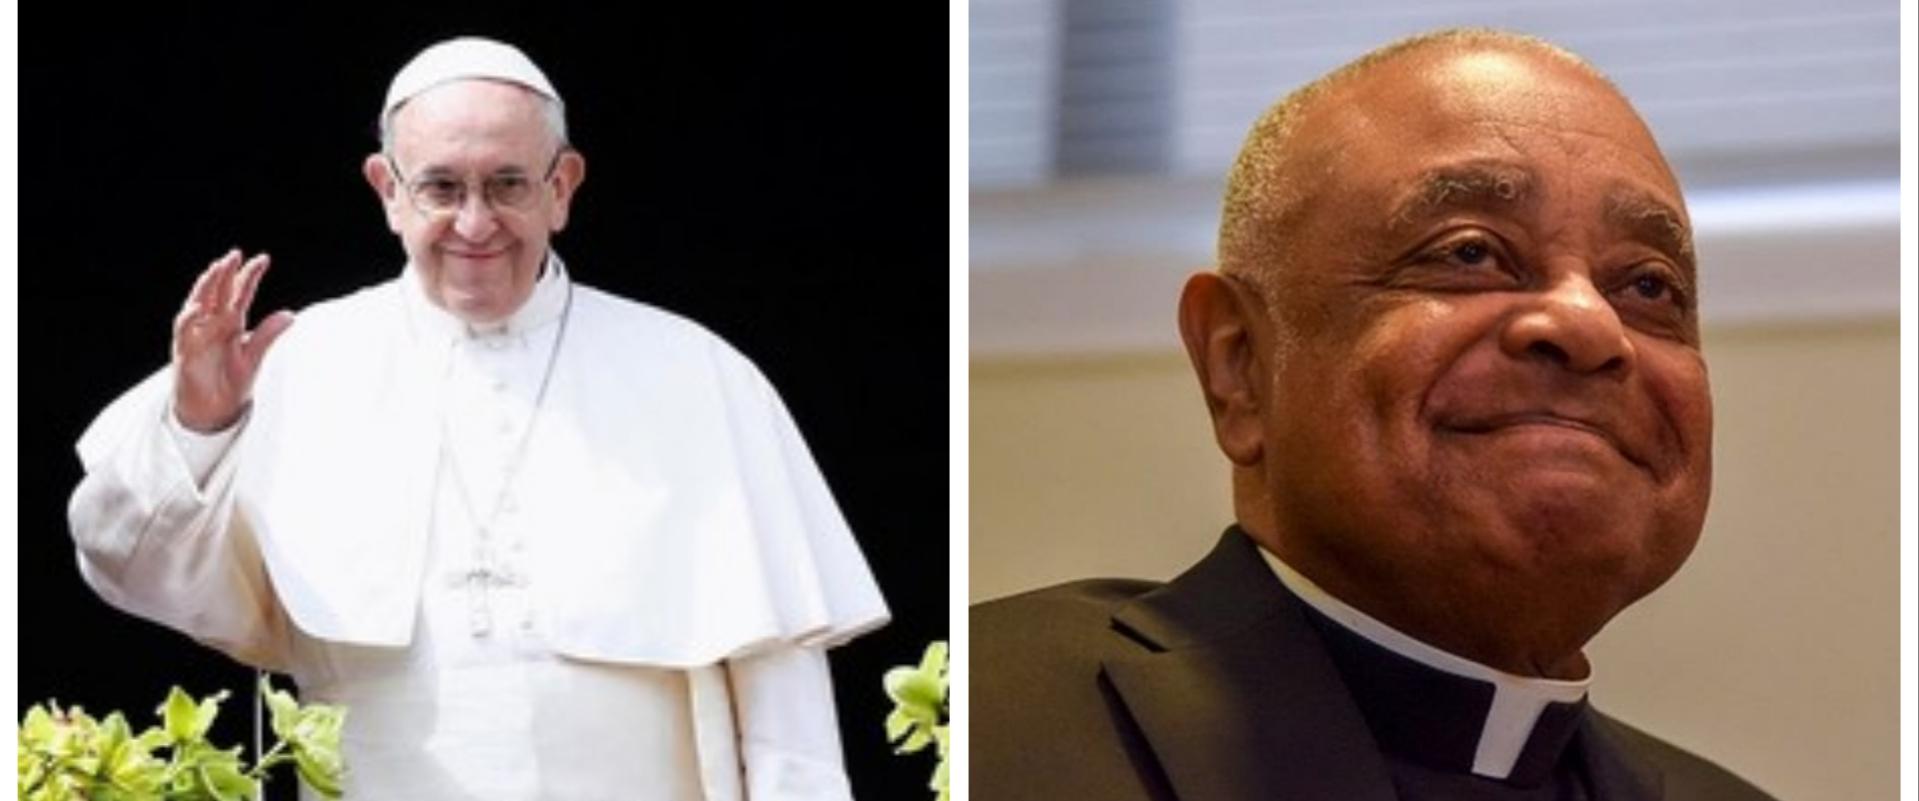 Gereja Katolik Ketambahan 13 Kardinal Baru, Empat Diantaranya Tak Bisa Ikut Konklaf